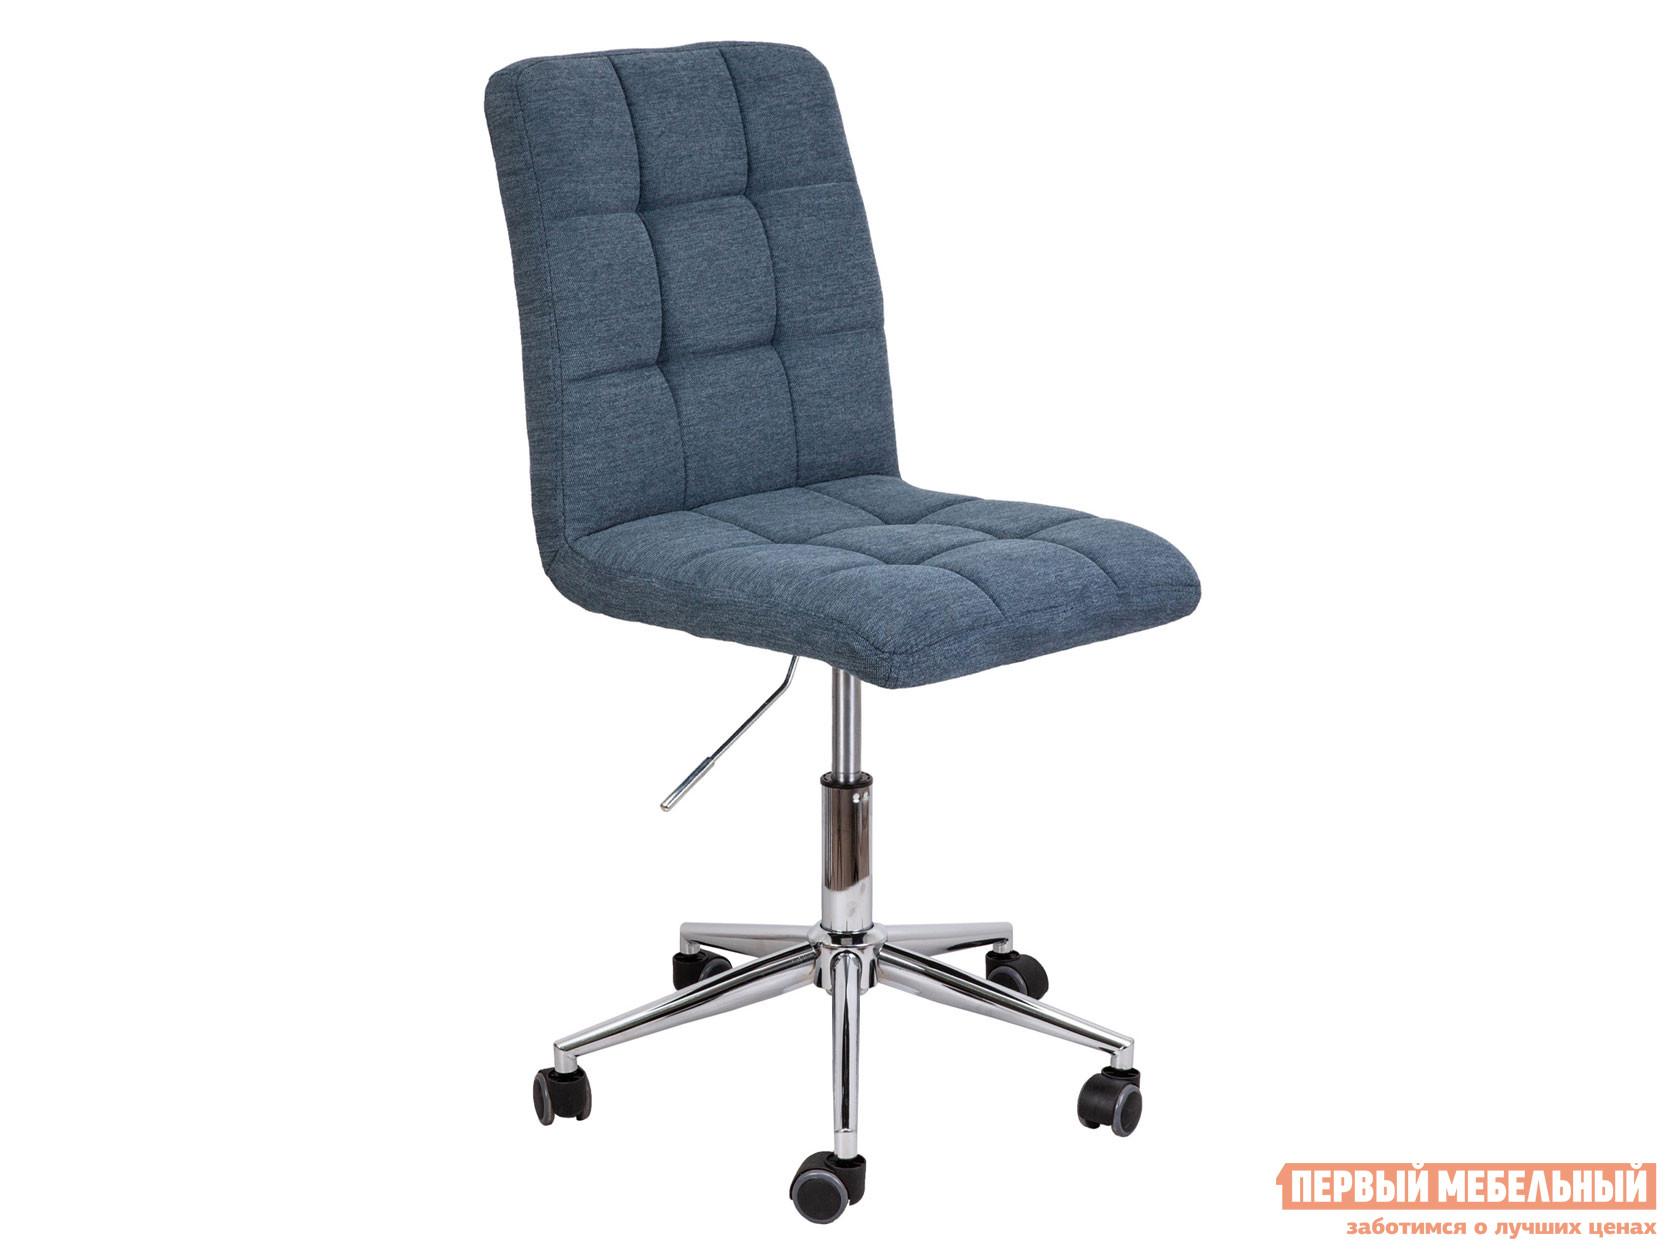 Офисное кресло  Стул FIJI, поворотный Темно-синий, ткань / Хром Sedia 124910